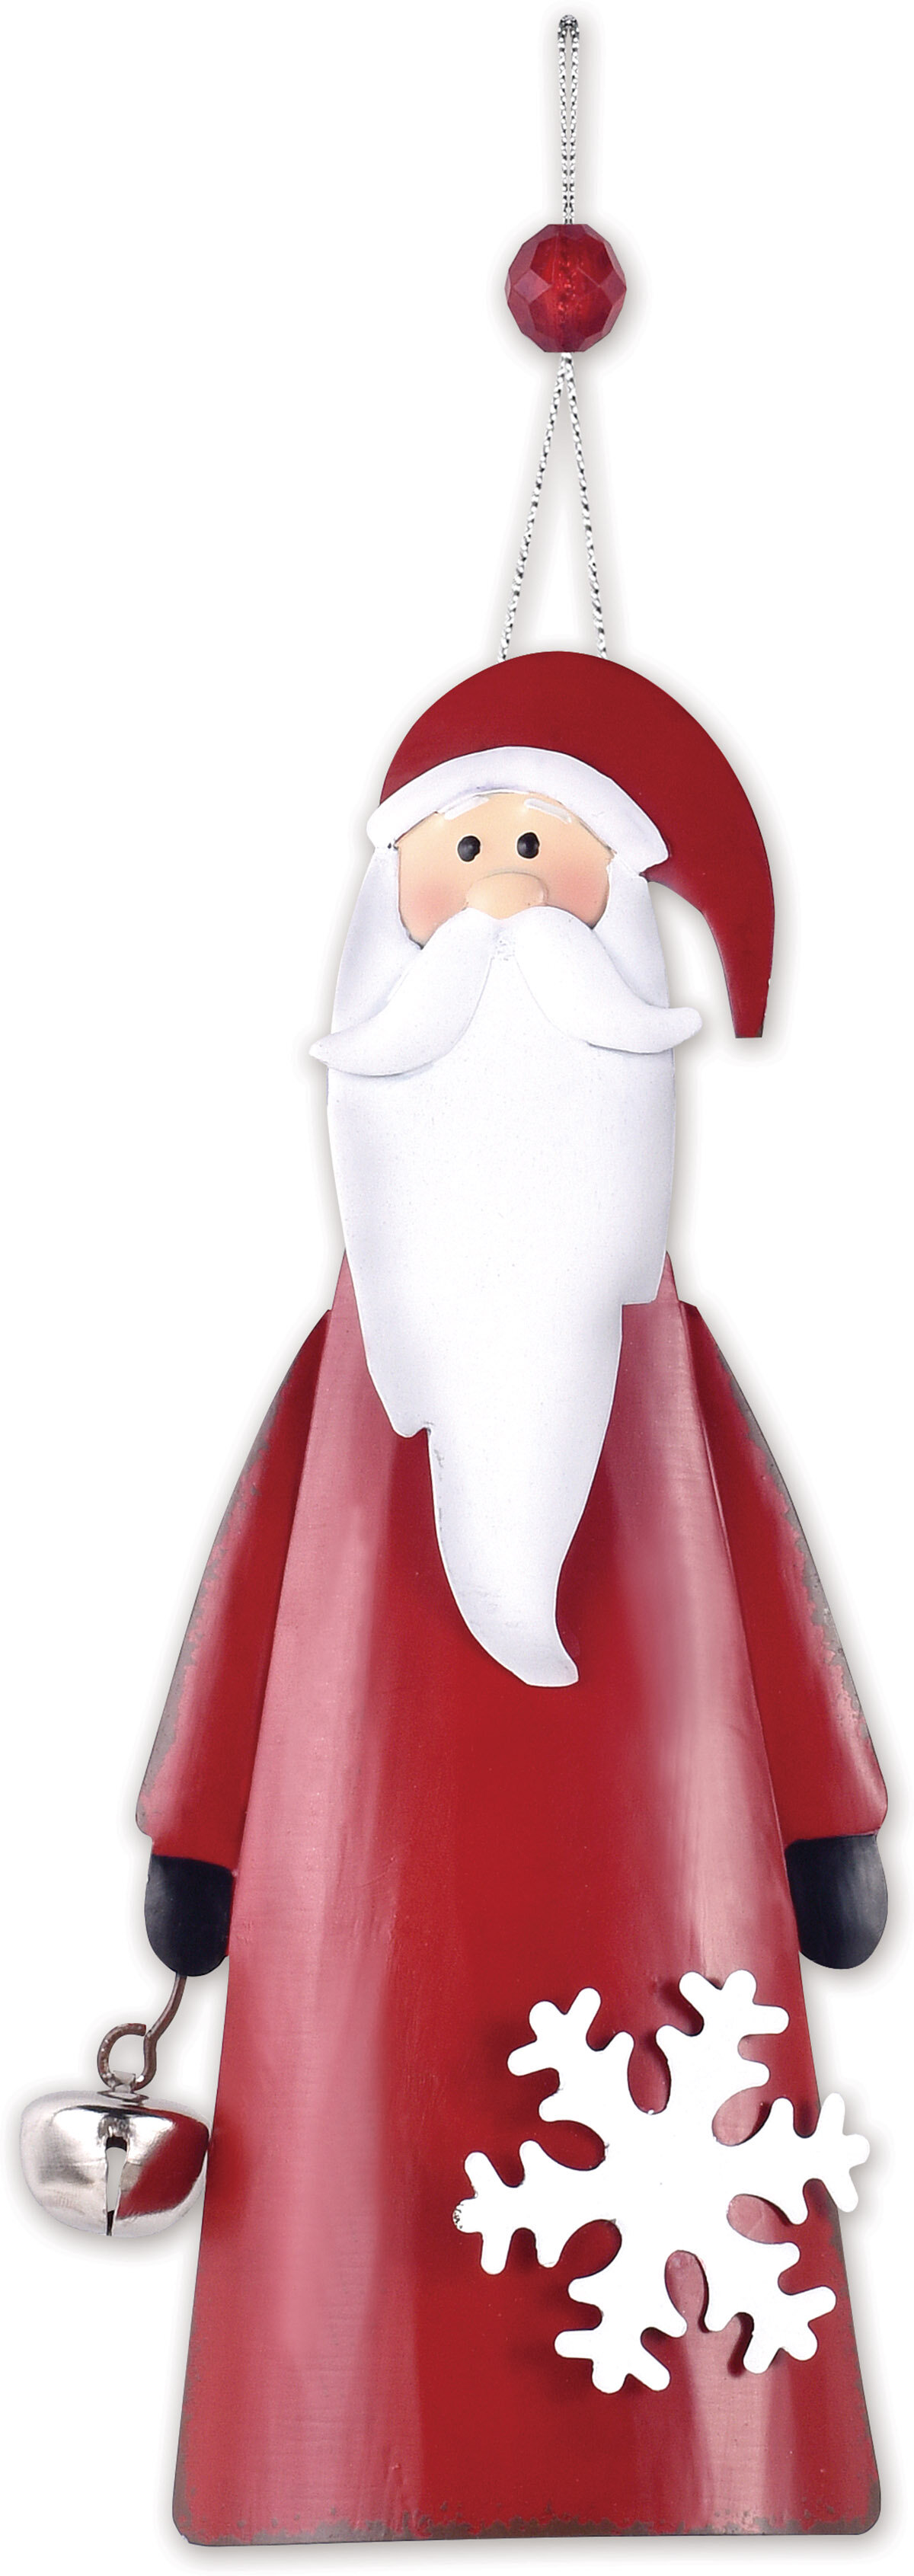 Santa Claus Christmas Ornament Sets You Ll Love In 2021 Wayfair